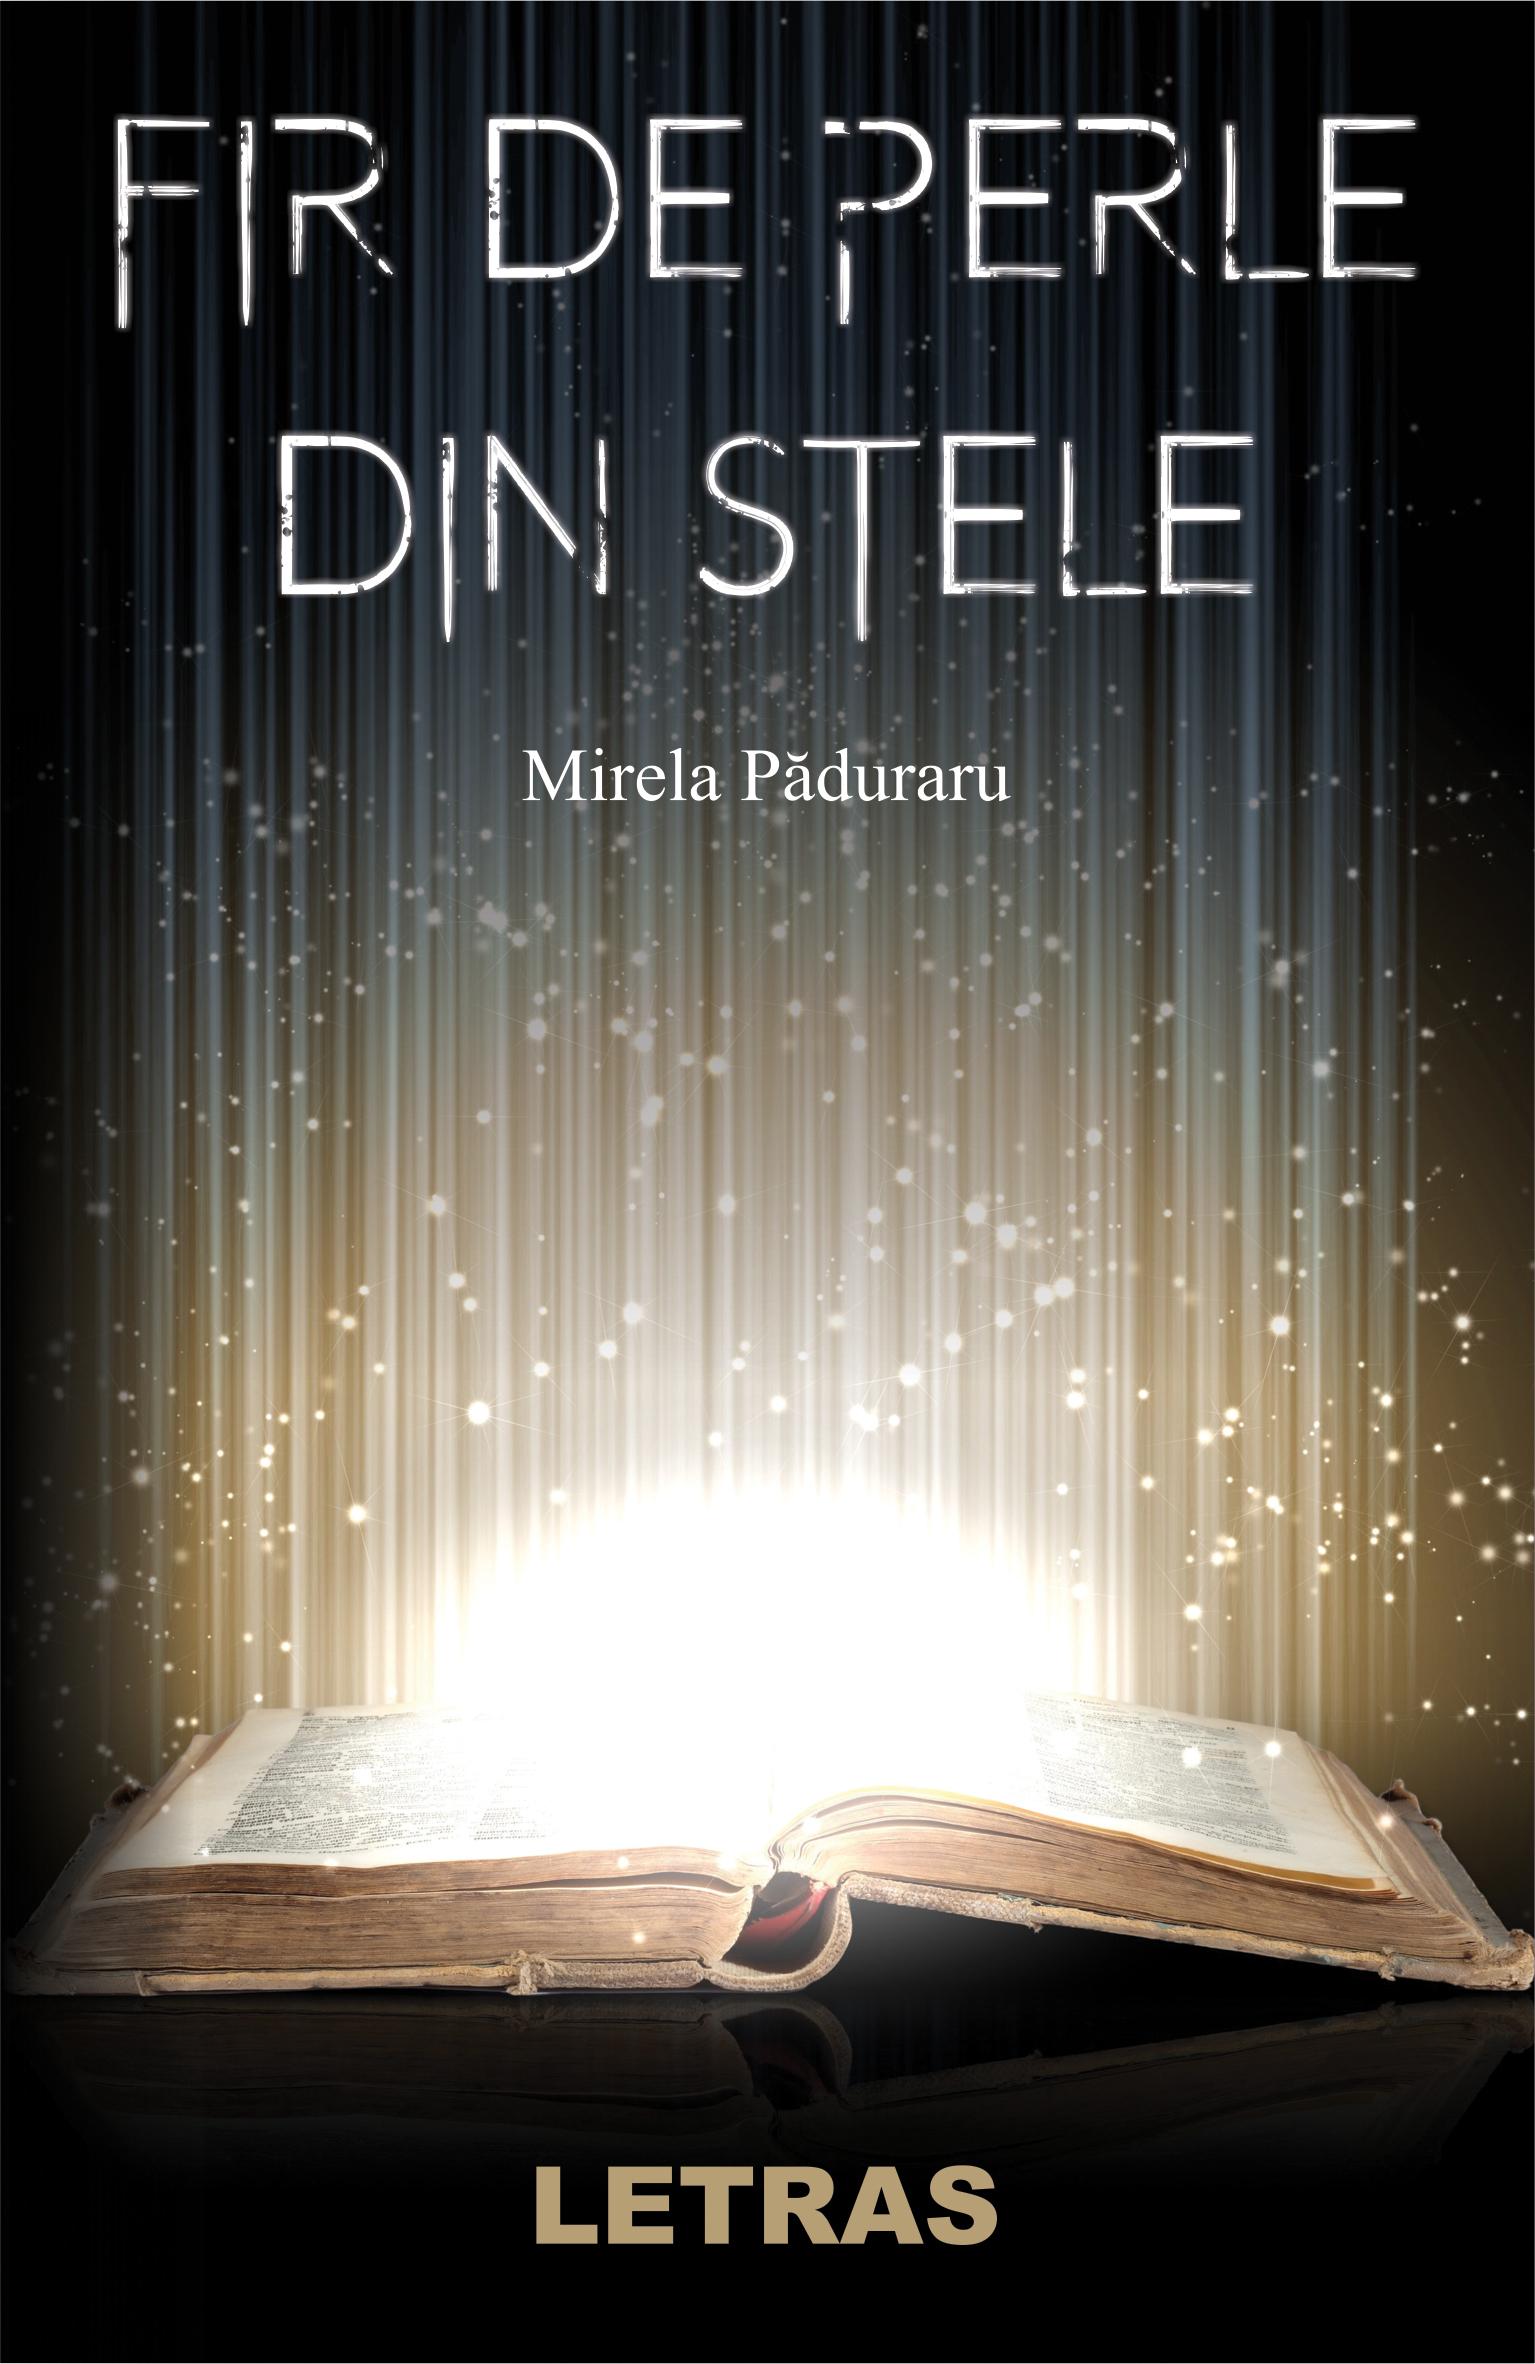 Paduraru Mirela_Fir de perle din stele_coperta 1_300 dpi_RGB